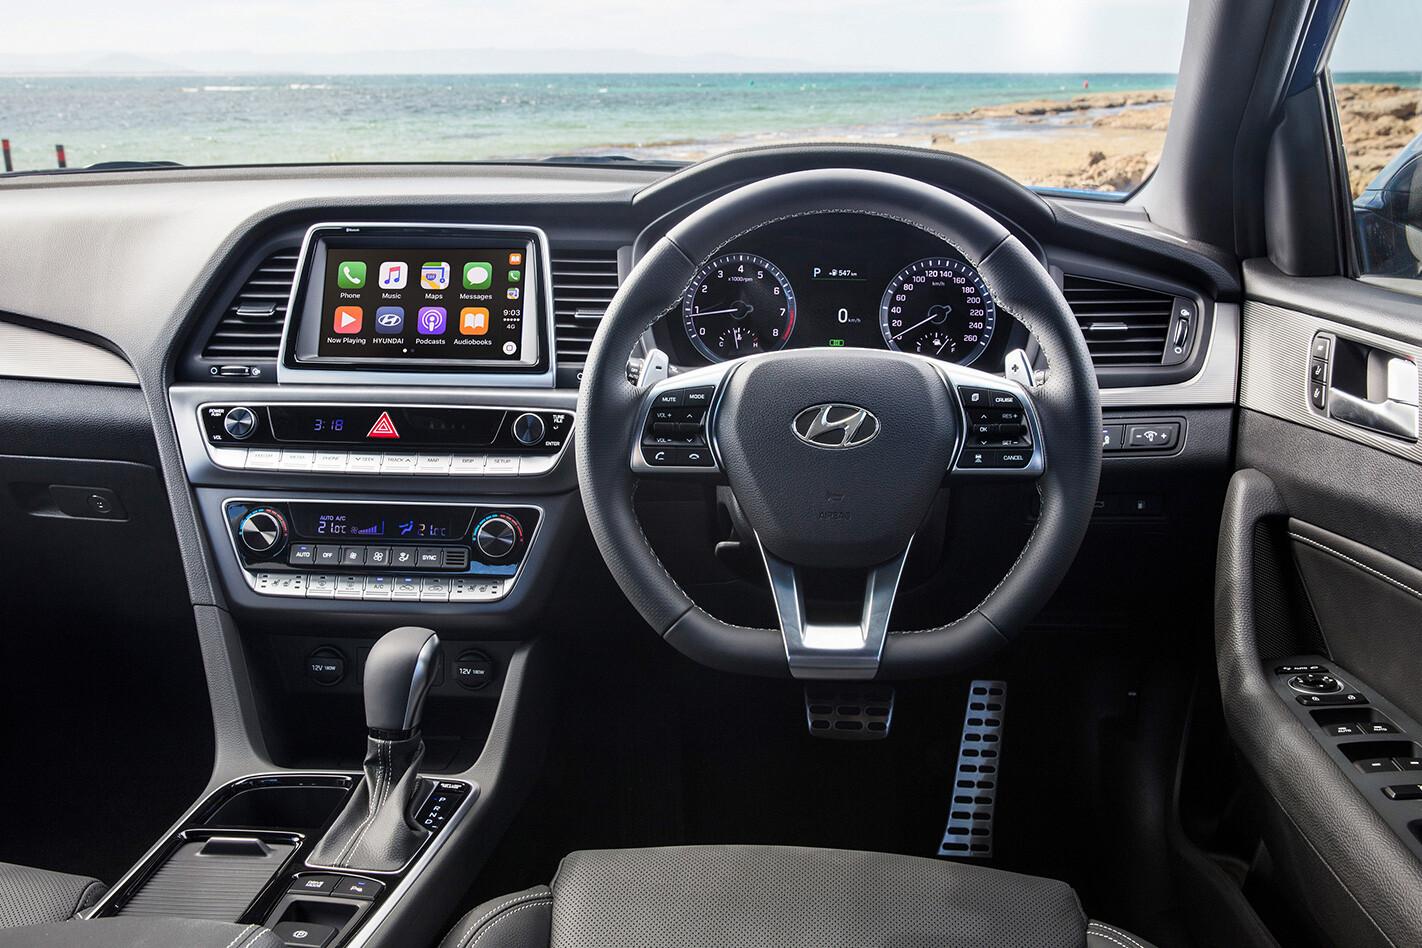 2018 Hyundai Sonata steering wheel